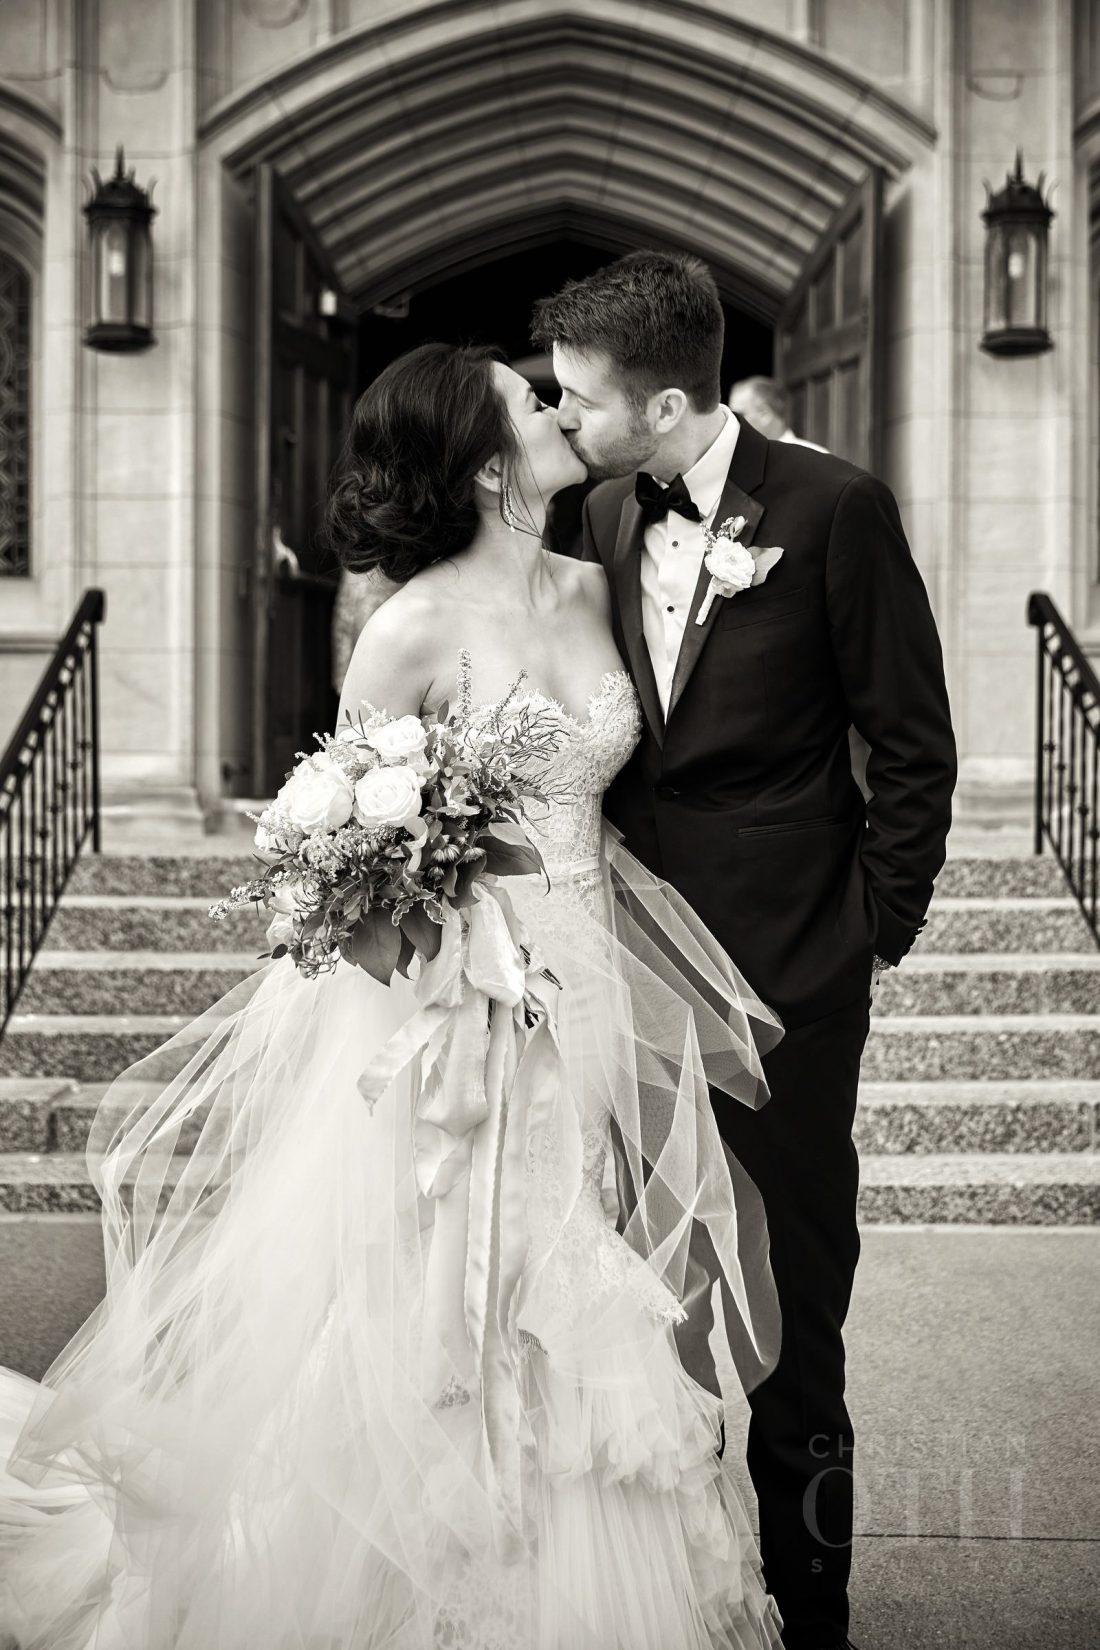 Joslyn Art Museum Omaha Nebraska Wedding Bride and Groom Kiss